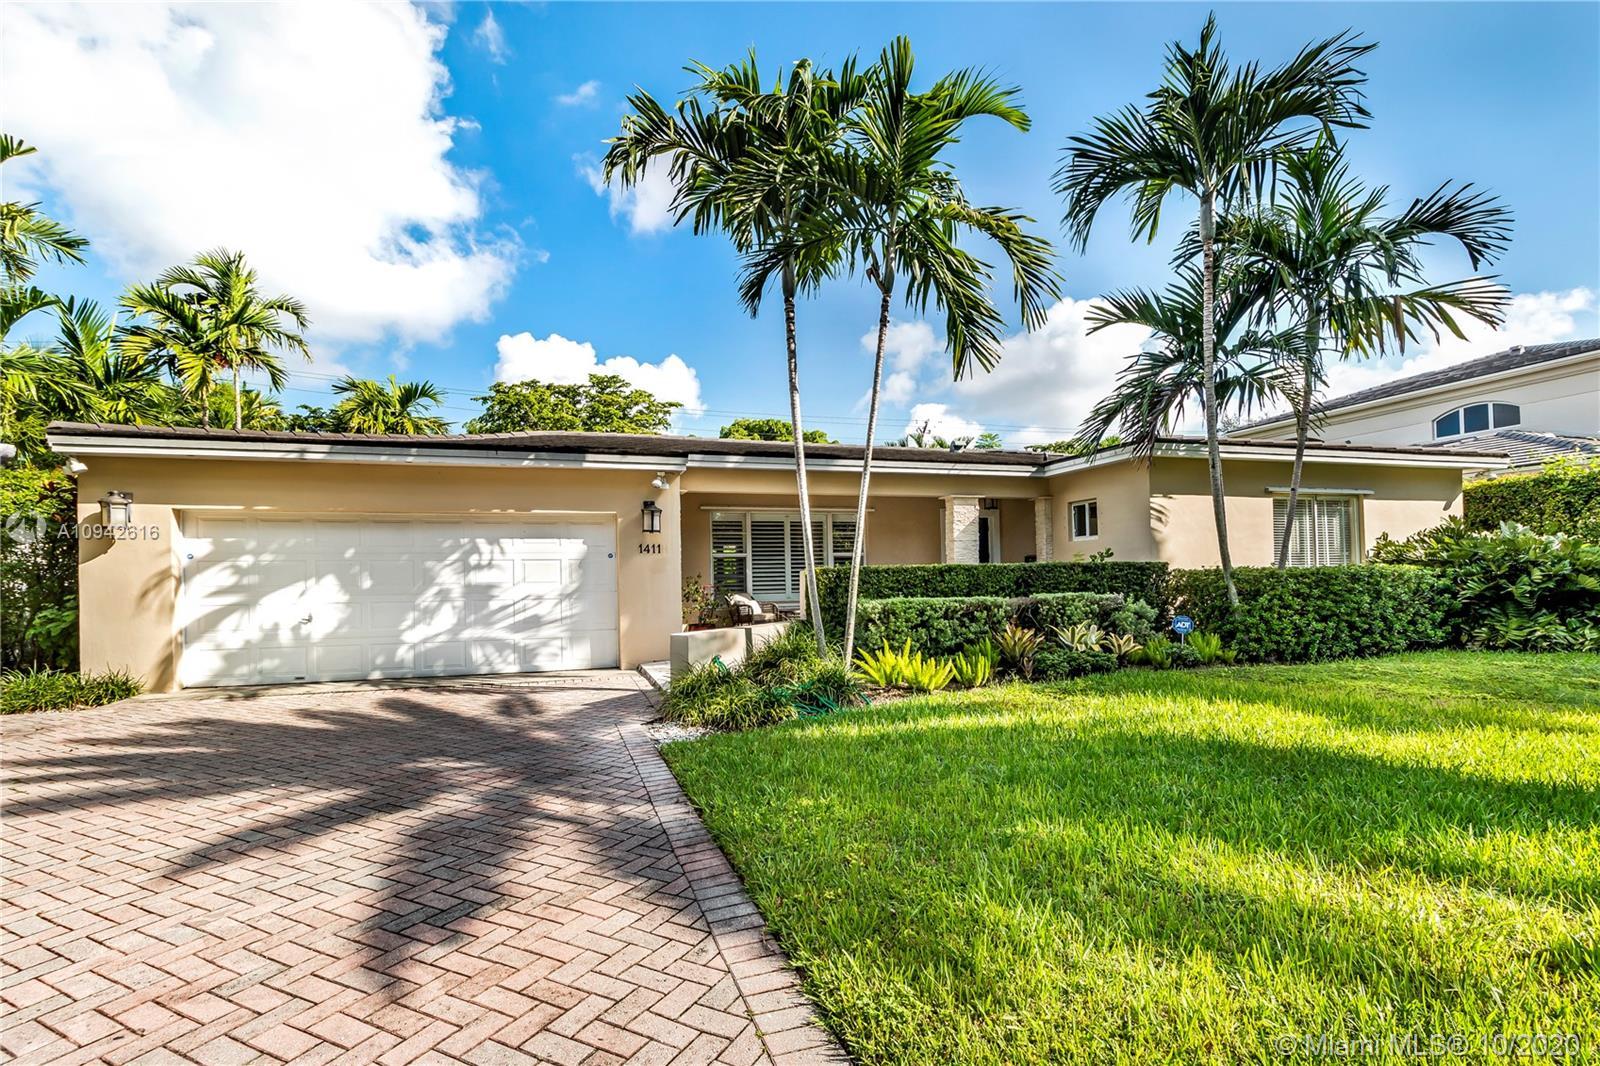 South Miami - 1411 Blue Rd, Coral Gables, FL 33146